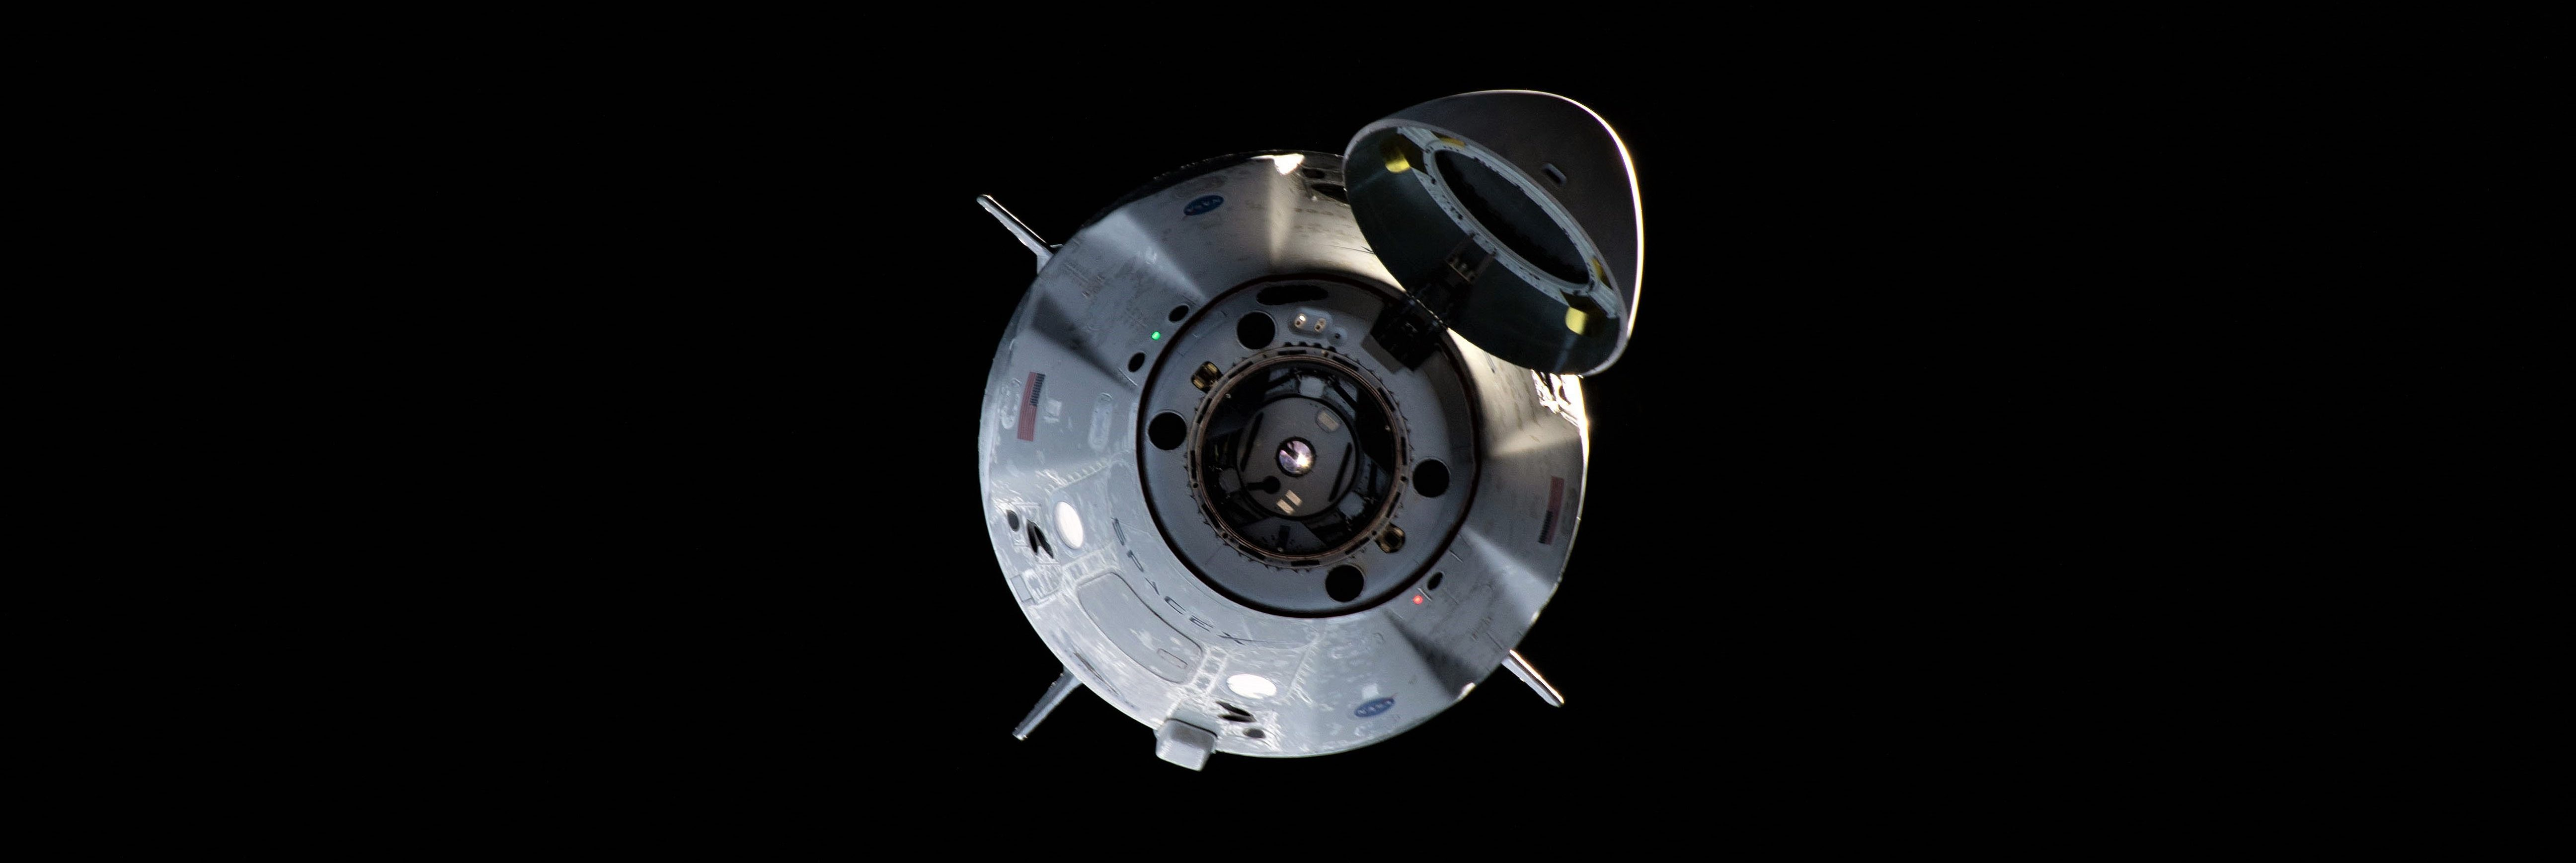 Crew Dragon DM-1 ISS arrival 030319 (NASA) 3 crop